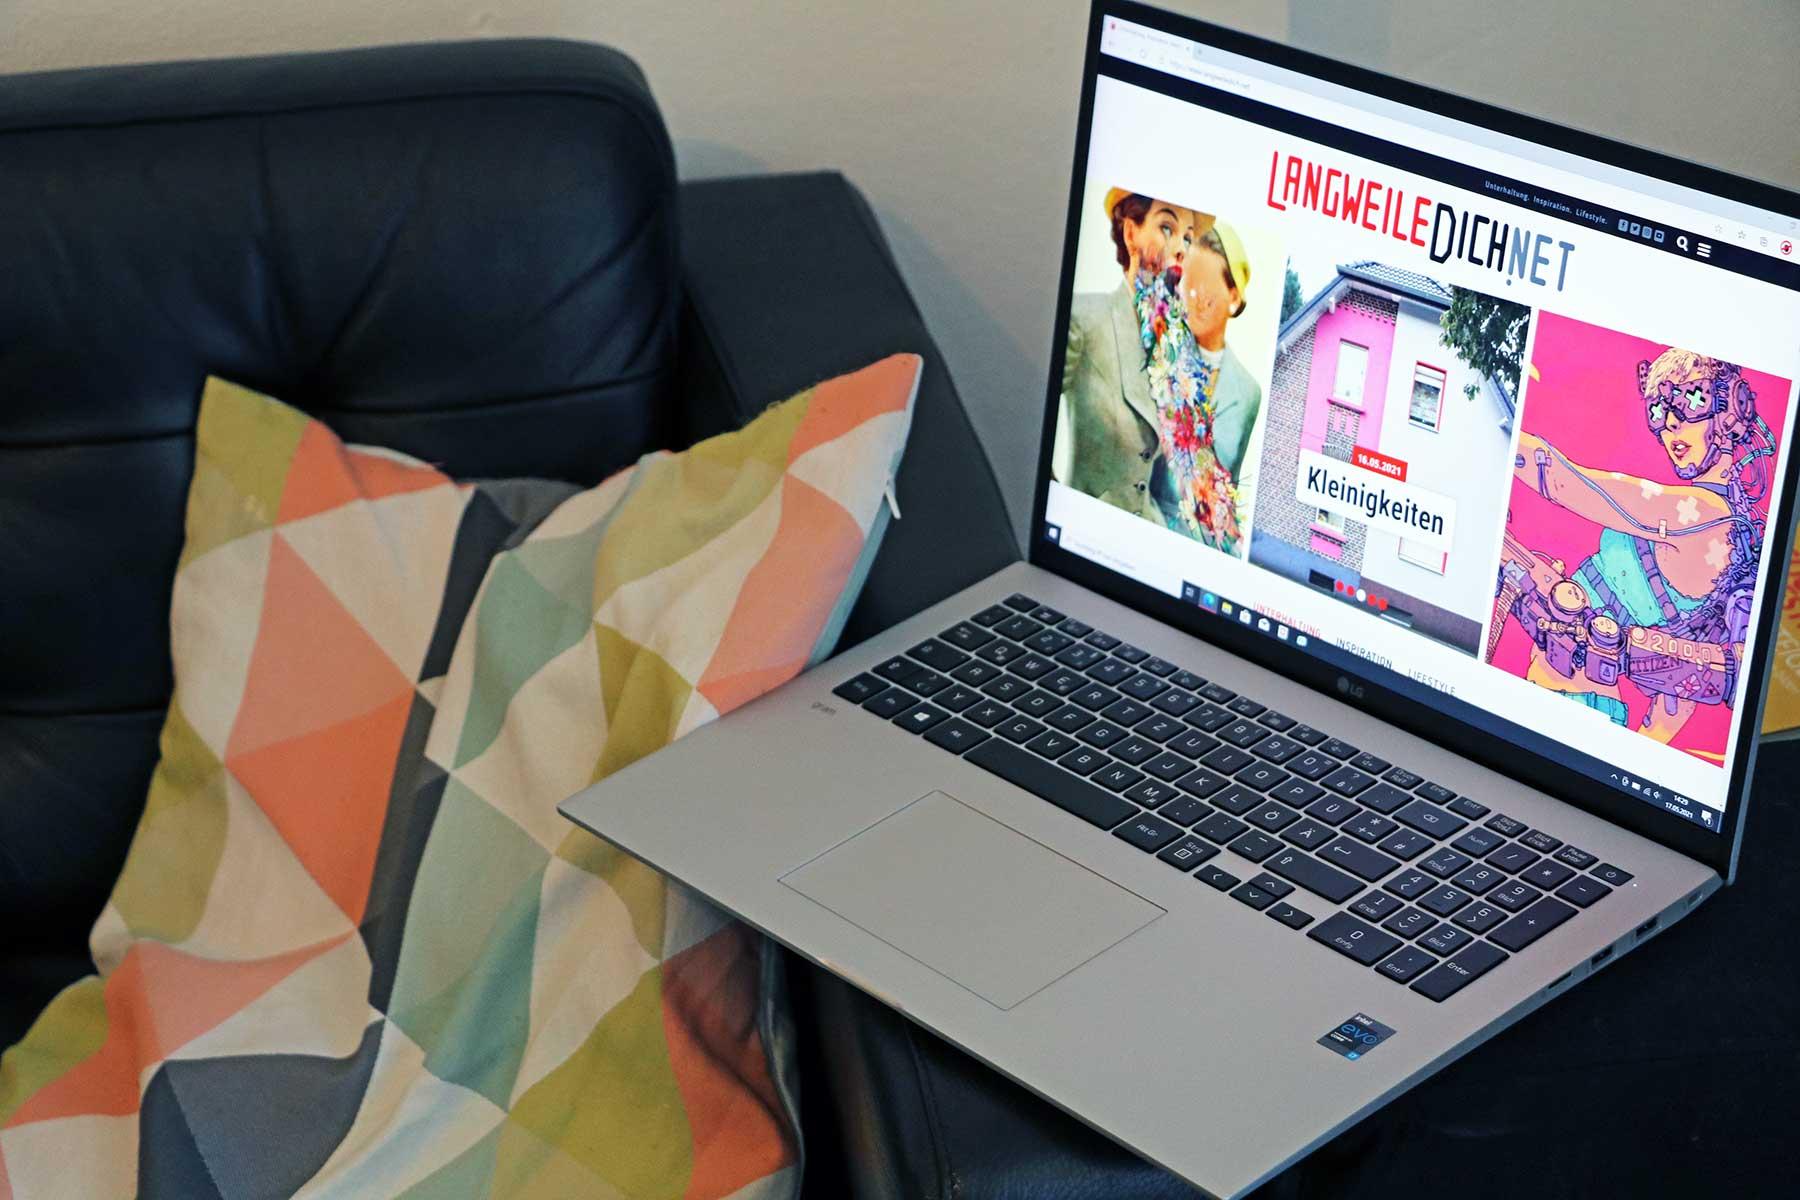 Laptop-Testbericht: Neues LG gram 17-Zoll-Notebook (2021er Version)